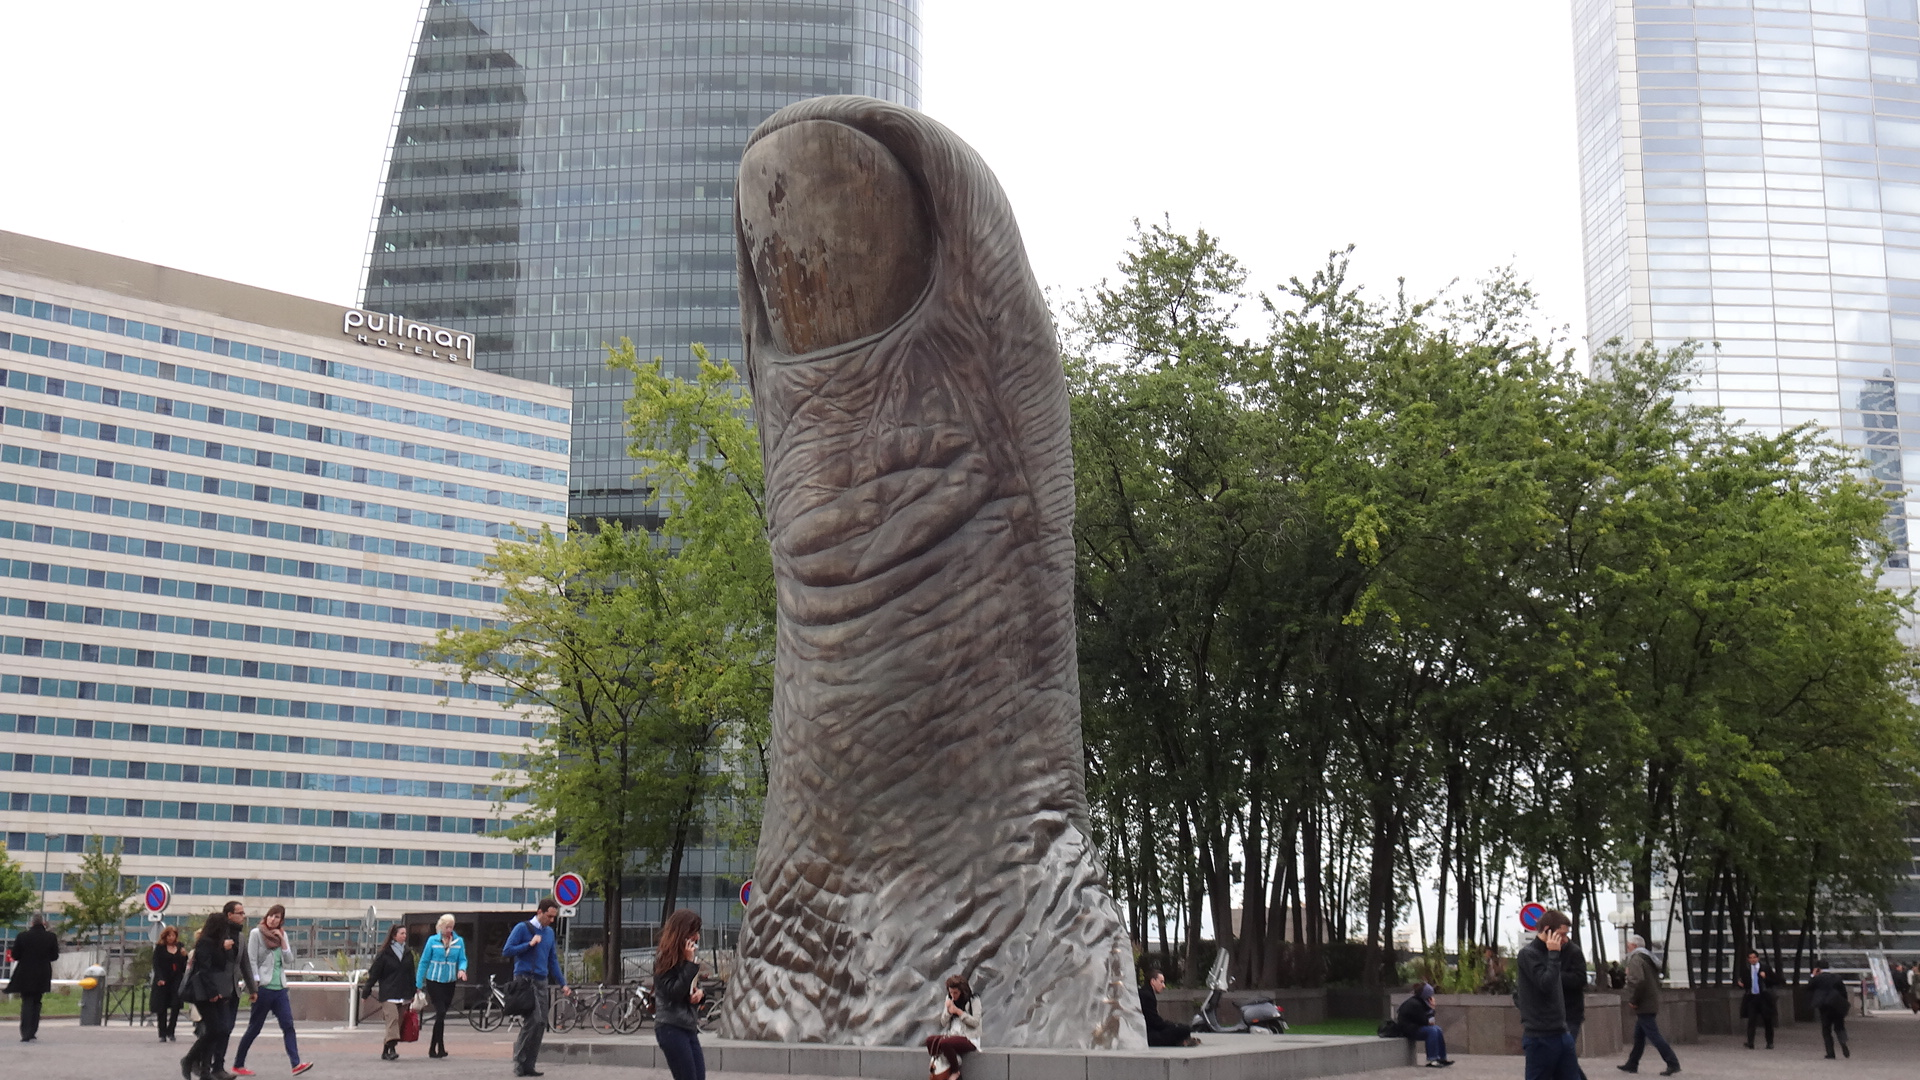 O polegar